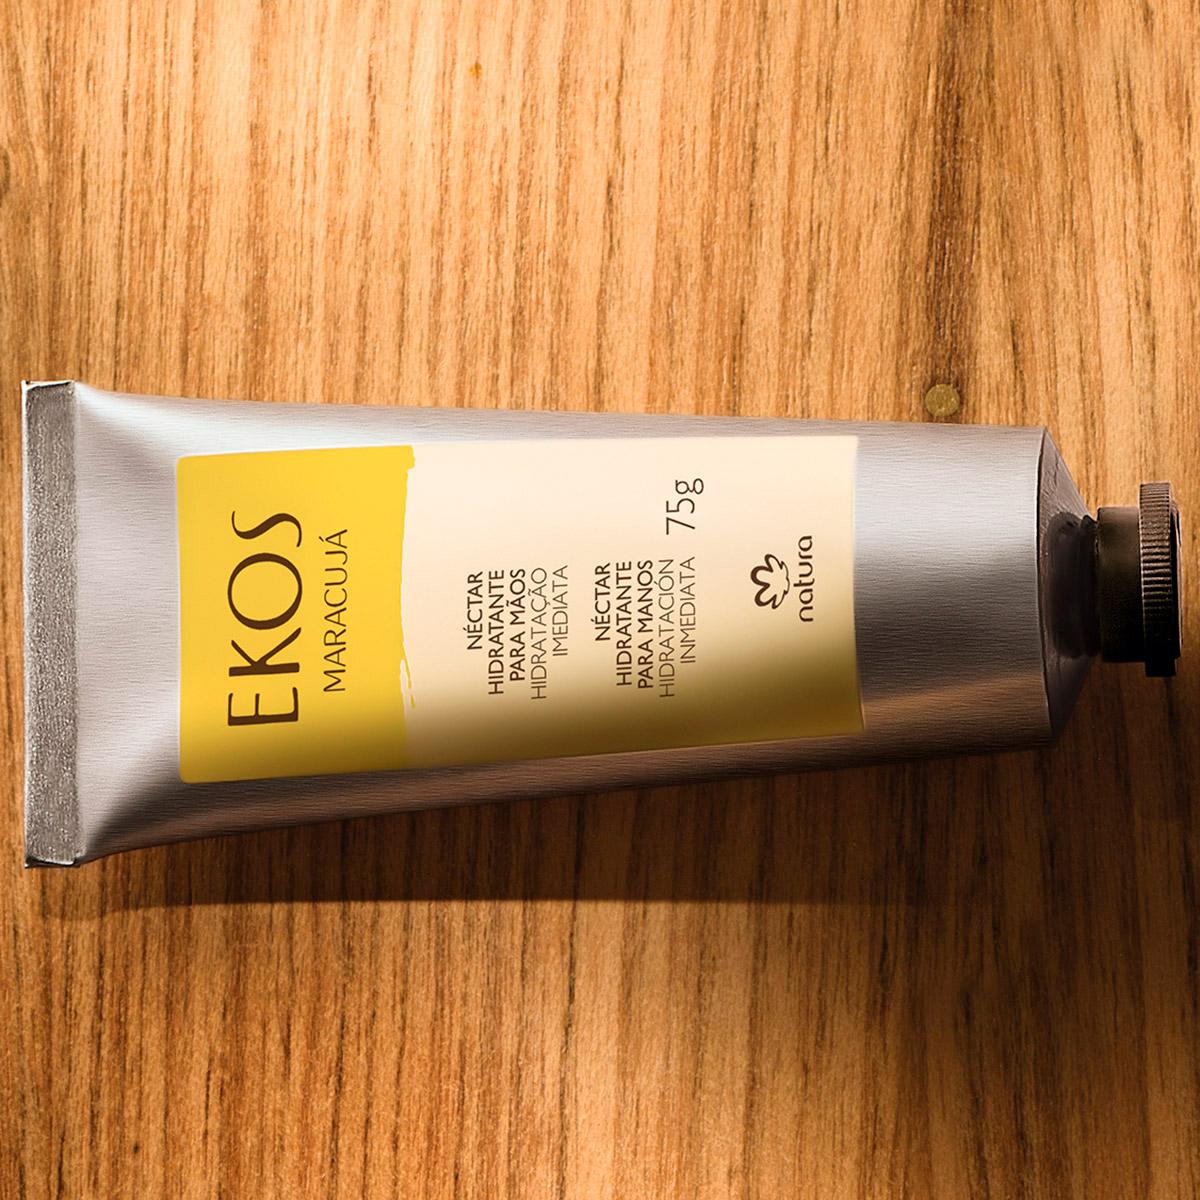 Néctar Hidratante para Mãos Maracujá Ekos - 75g - 62731